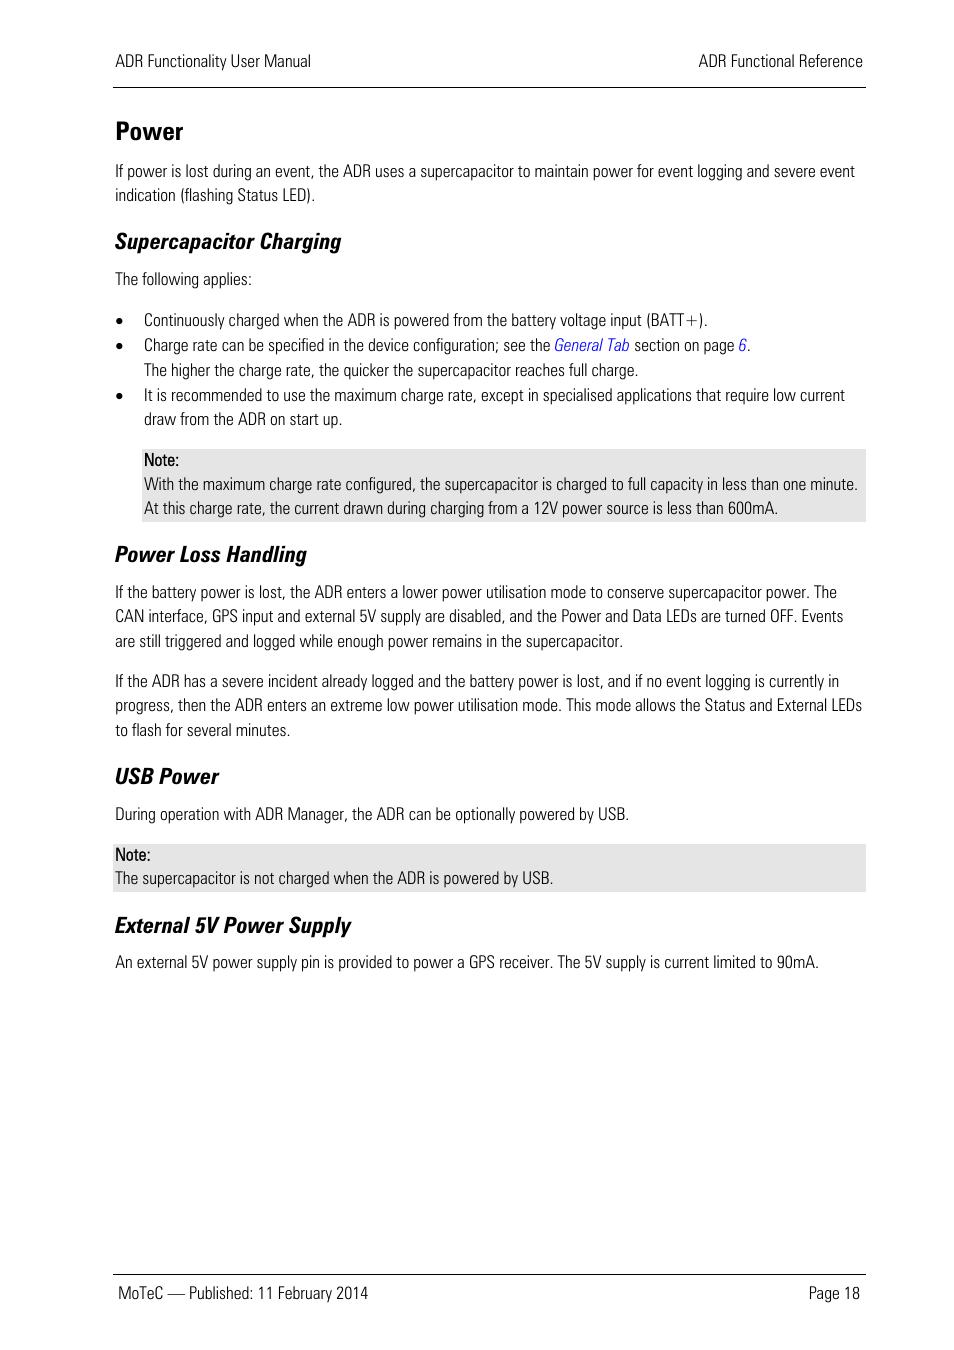 medium resolution of power supercapacitor charging power loss handling motec adr user manual page 19 25